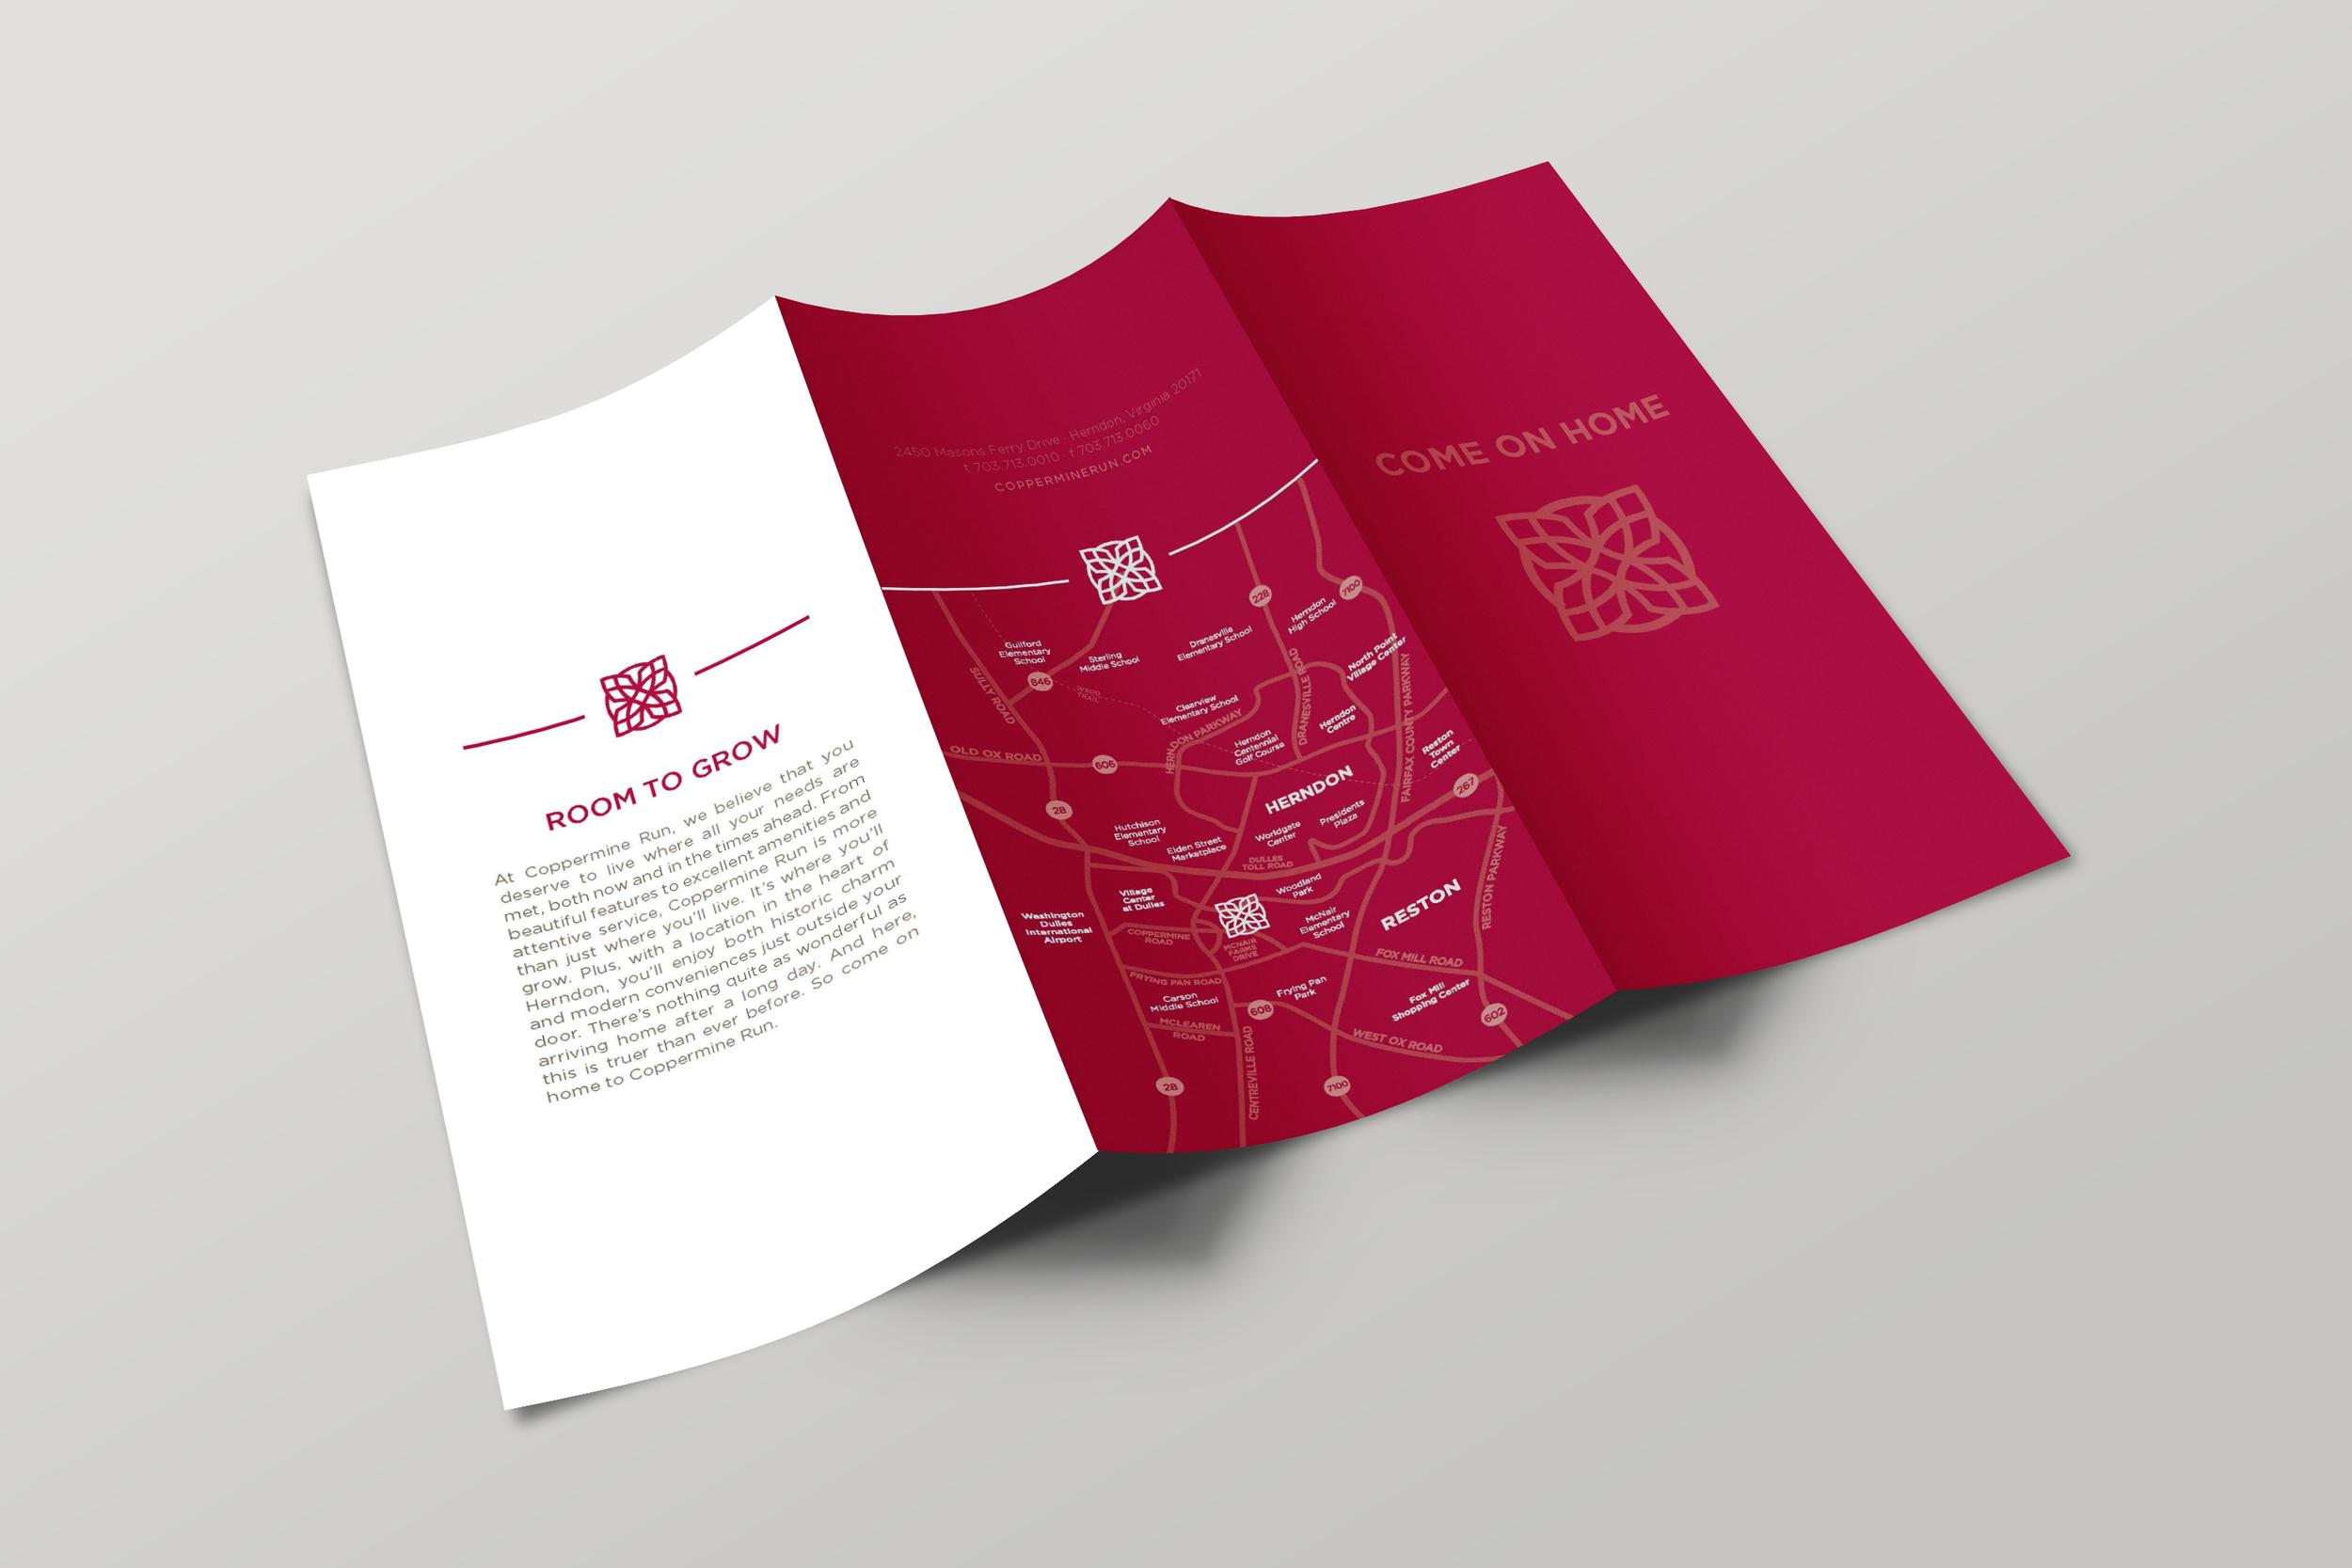 Tri Fold Brochure Mock-up Template - Outside.jpg